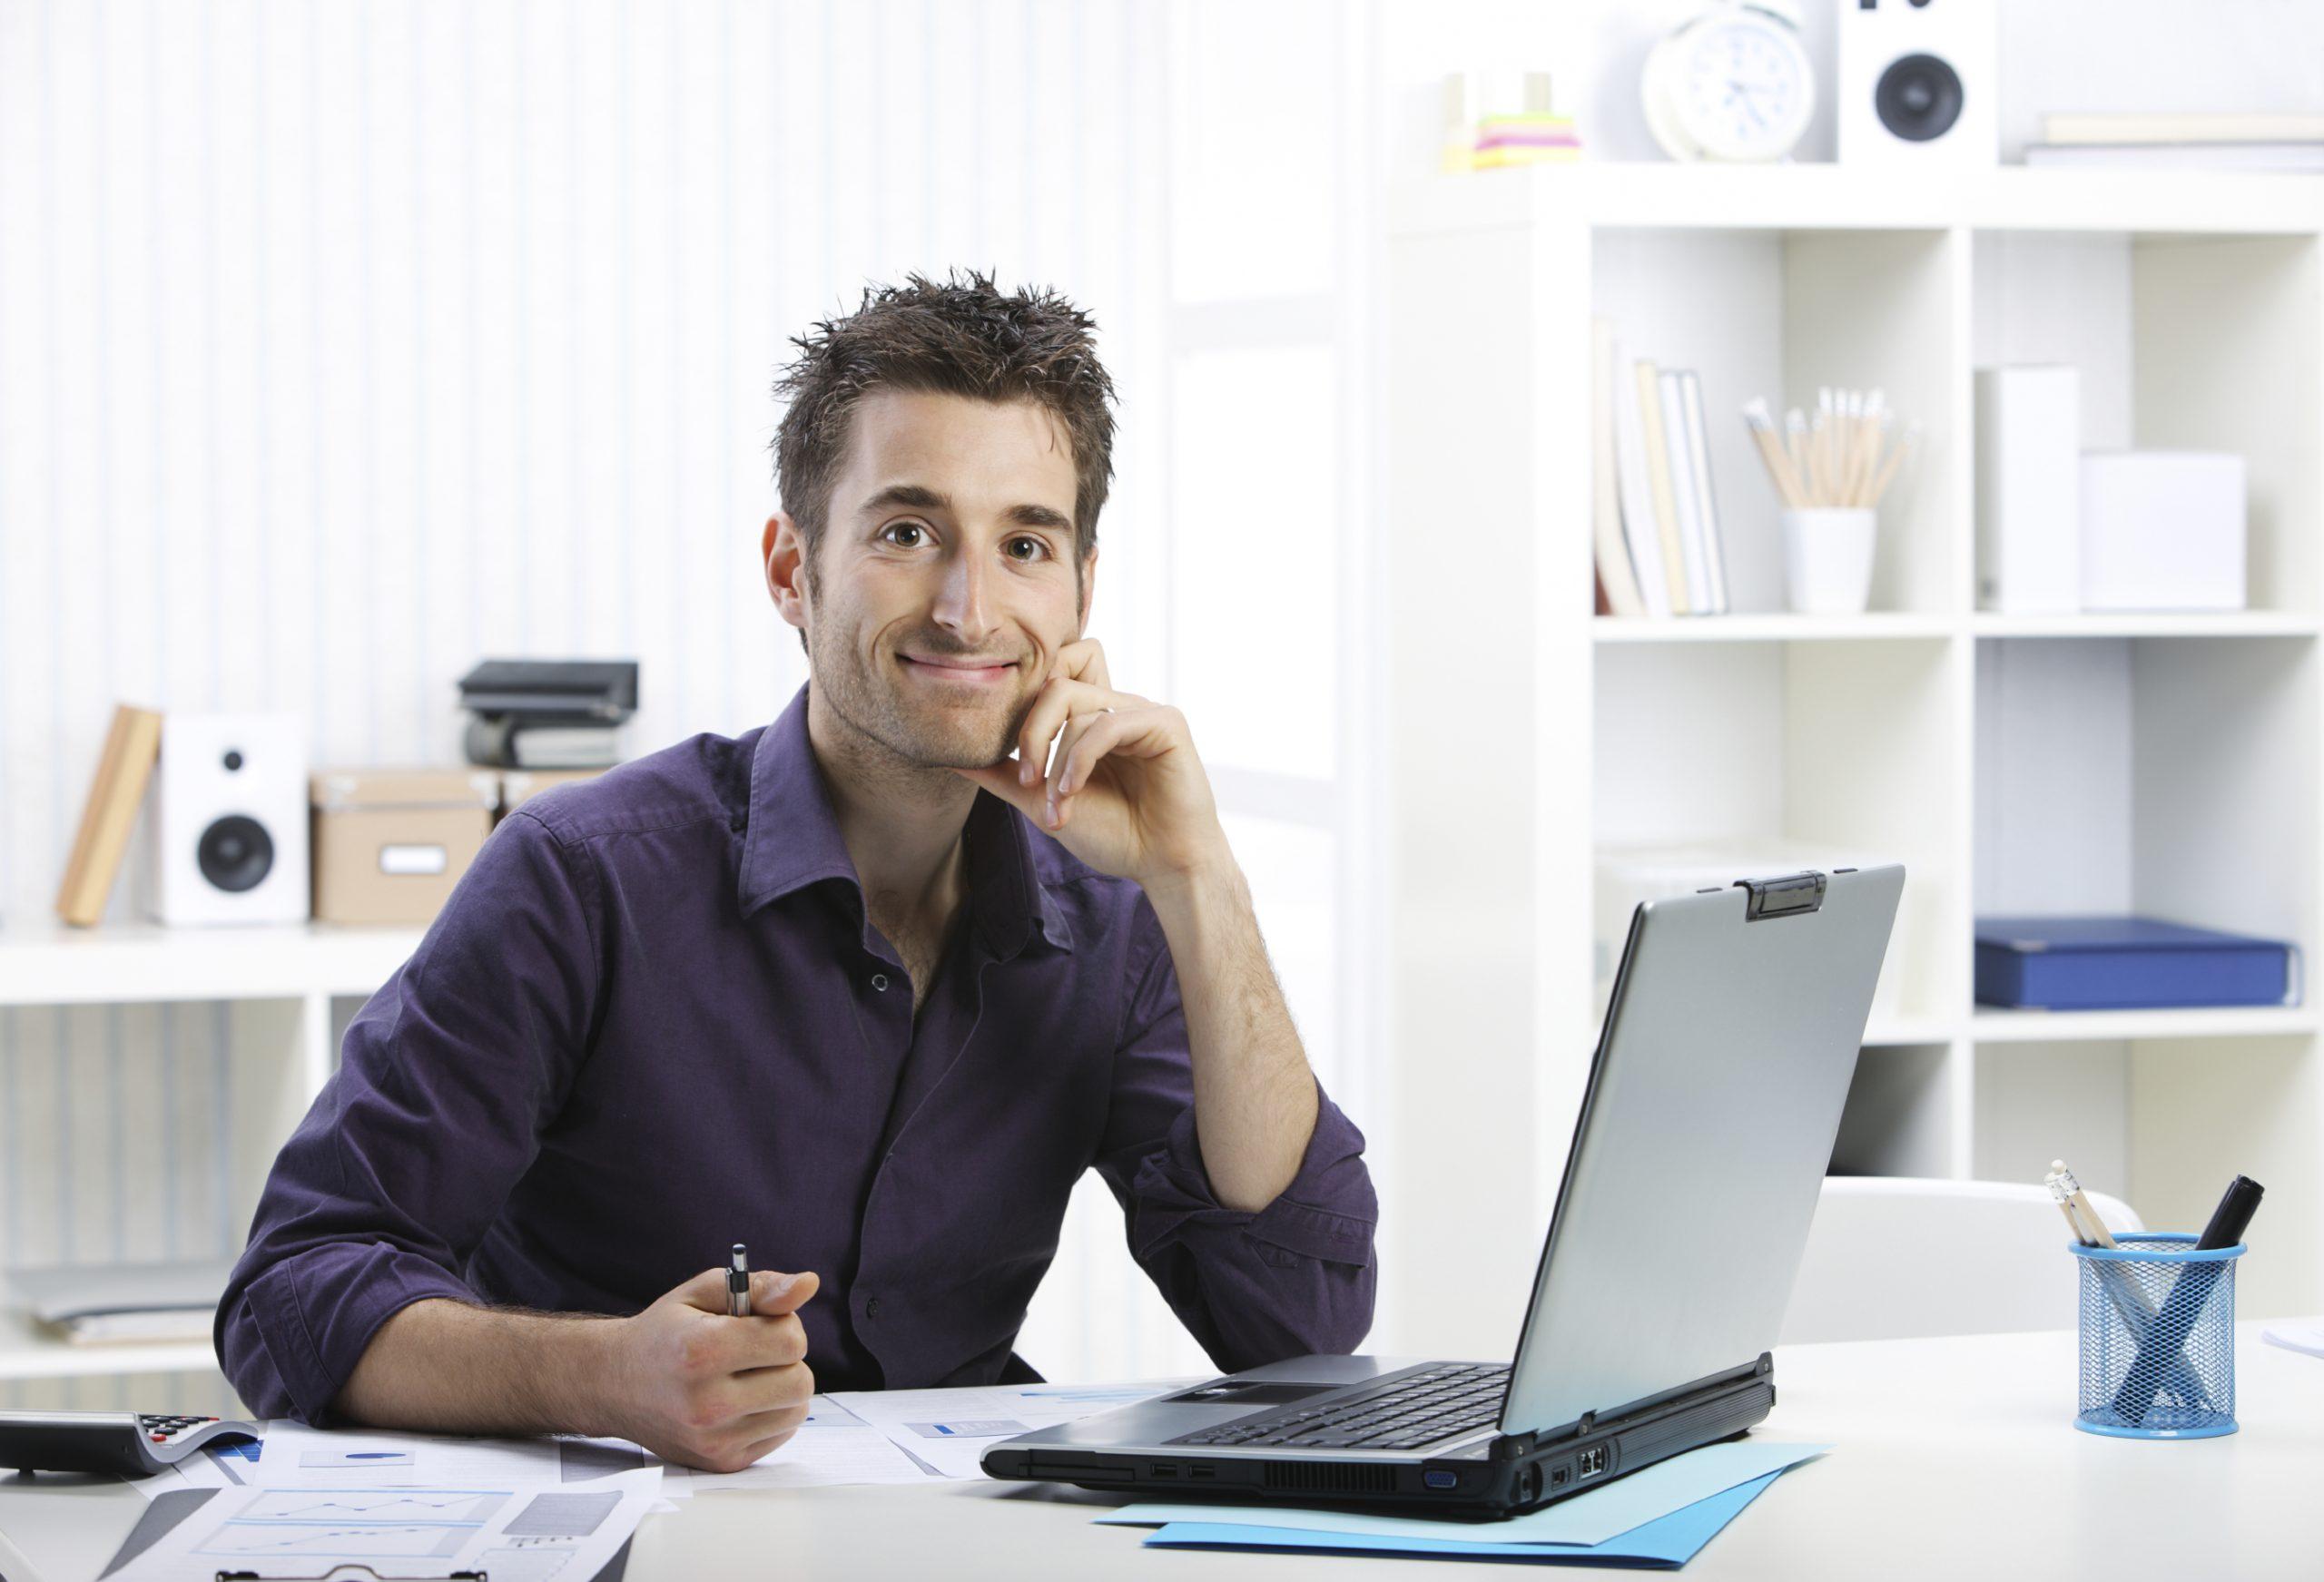 Guy Smiling at Laptop  Desk  scaled - Como funciona o suporte